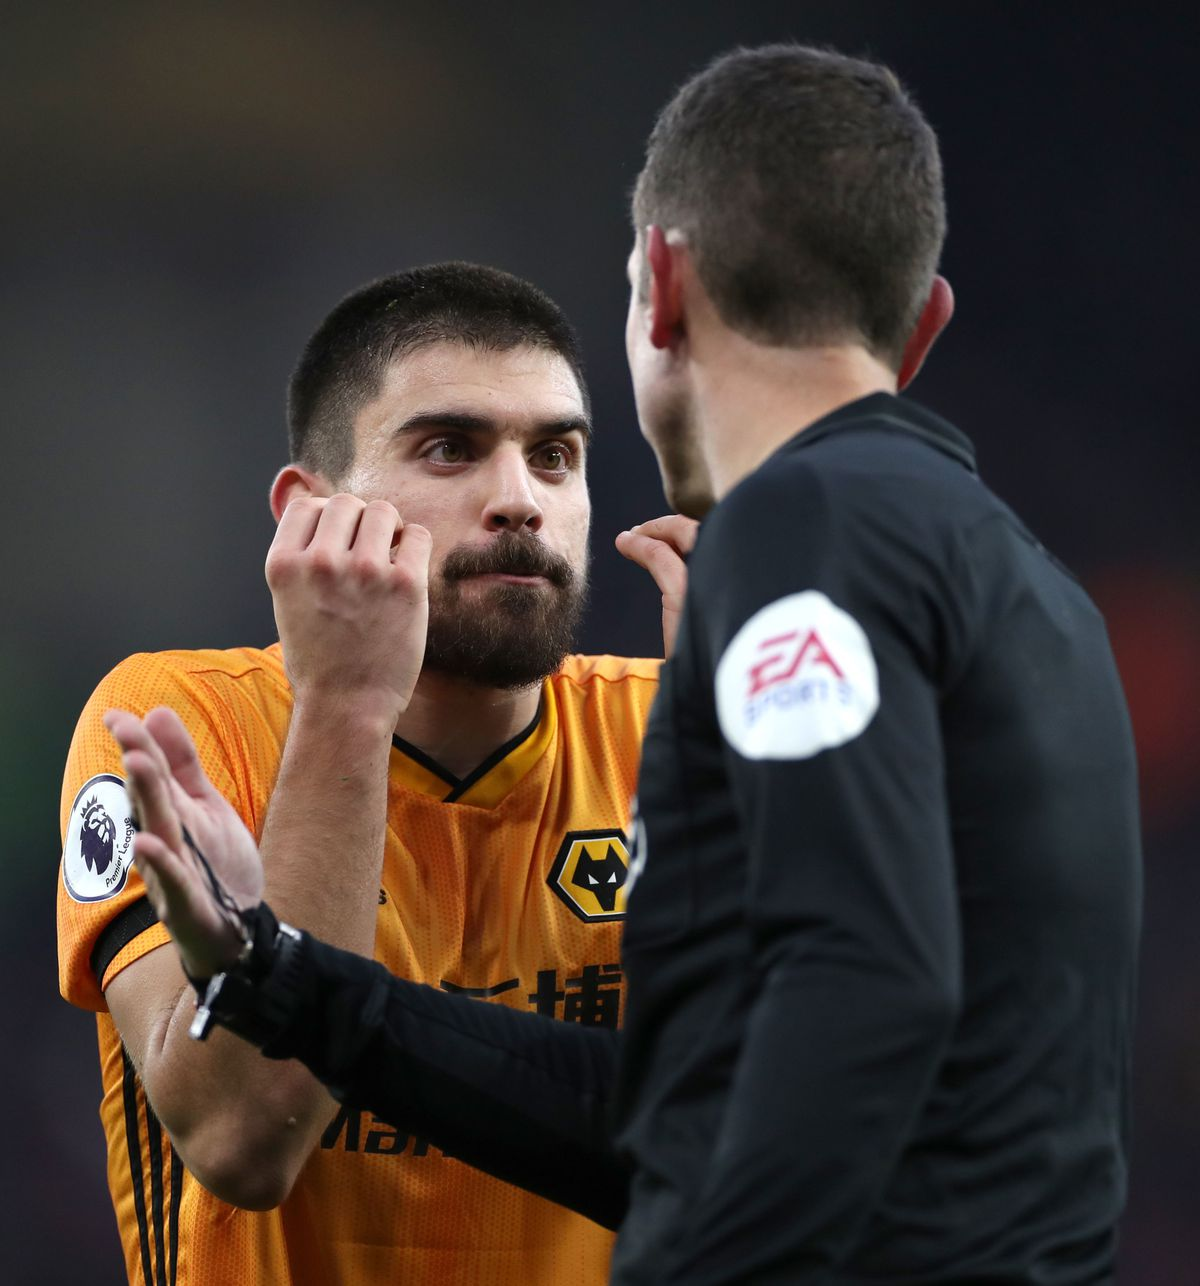 Wolverhampton Wanderers's Ruben Neves gestures to referee David Coote